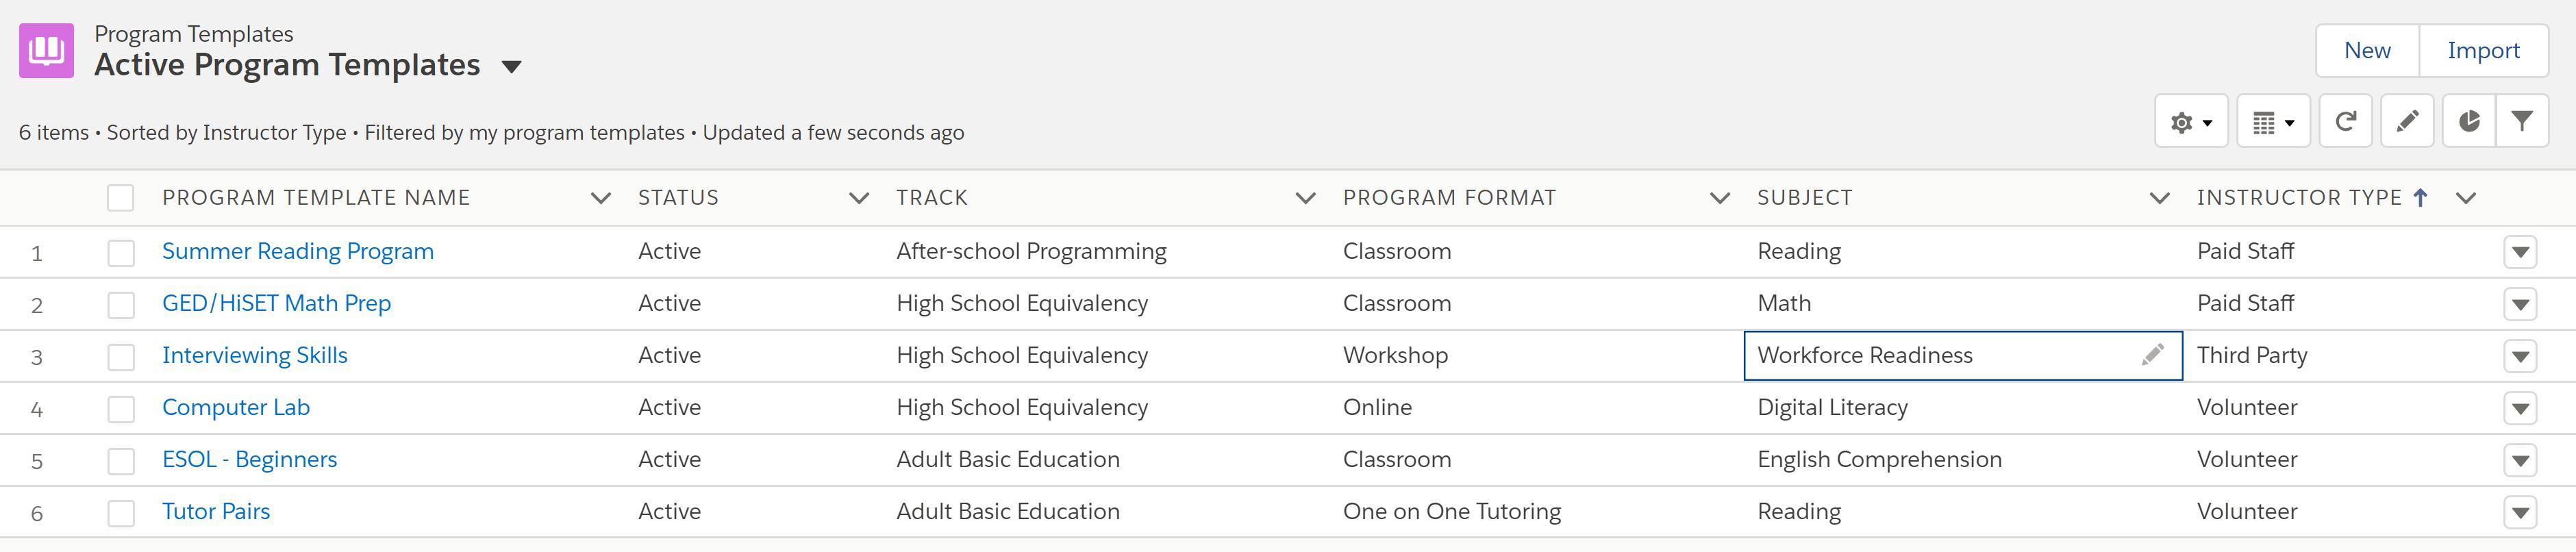 5 Active Programs